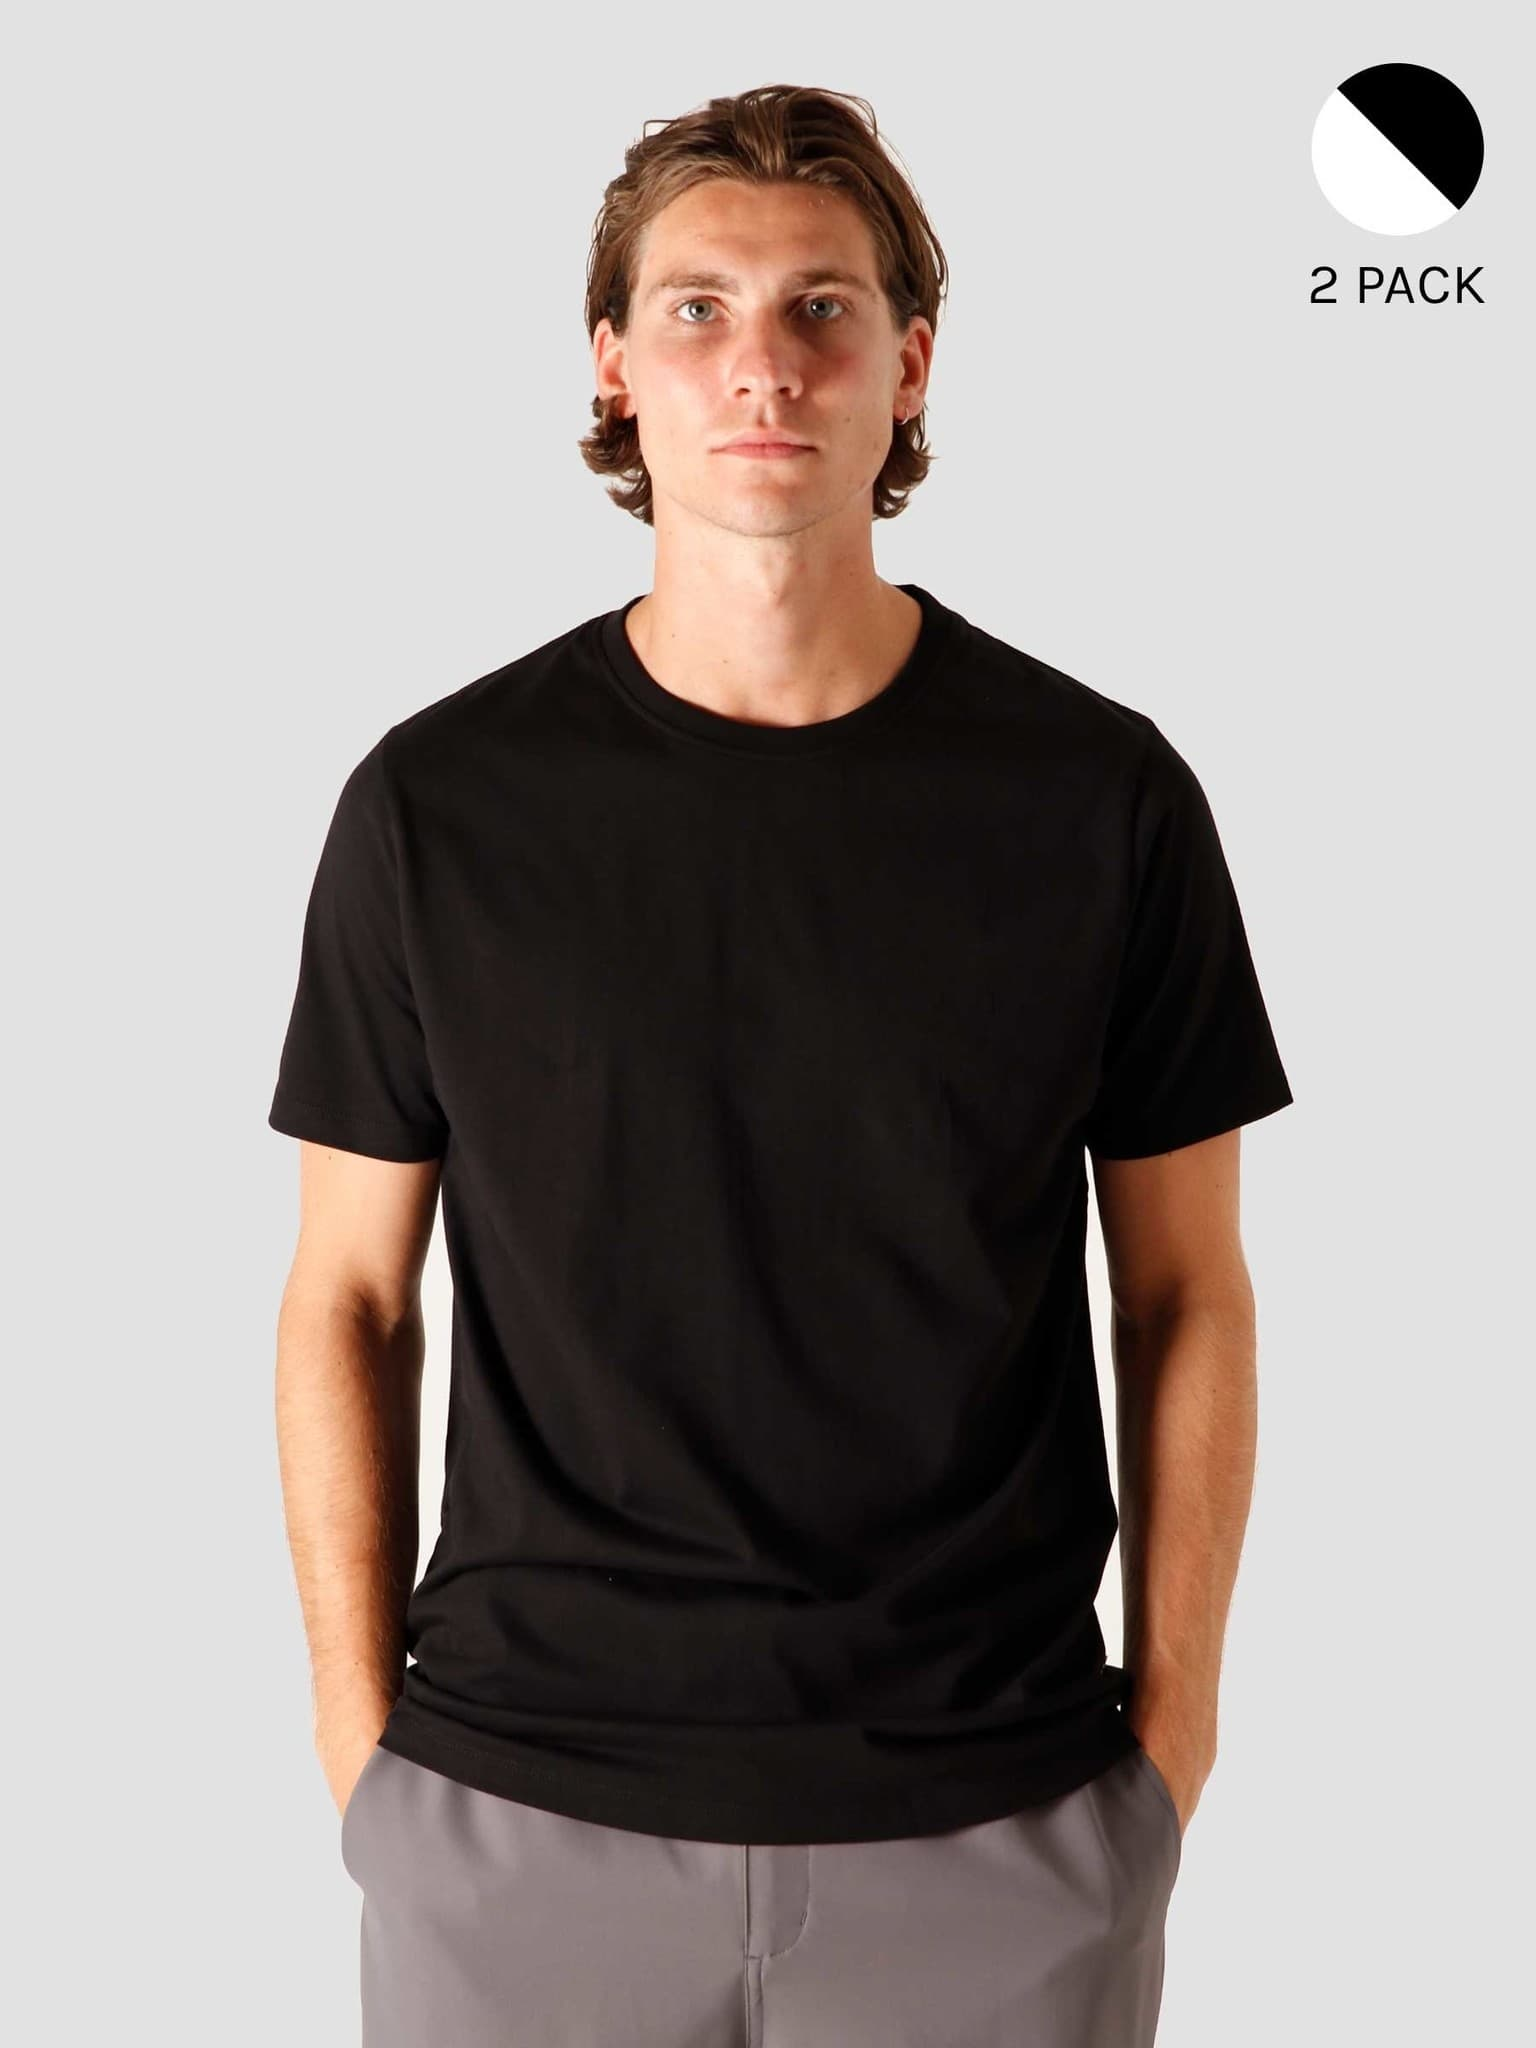 2-Pack QB01 Mix T-shirt Black and White